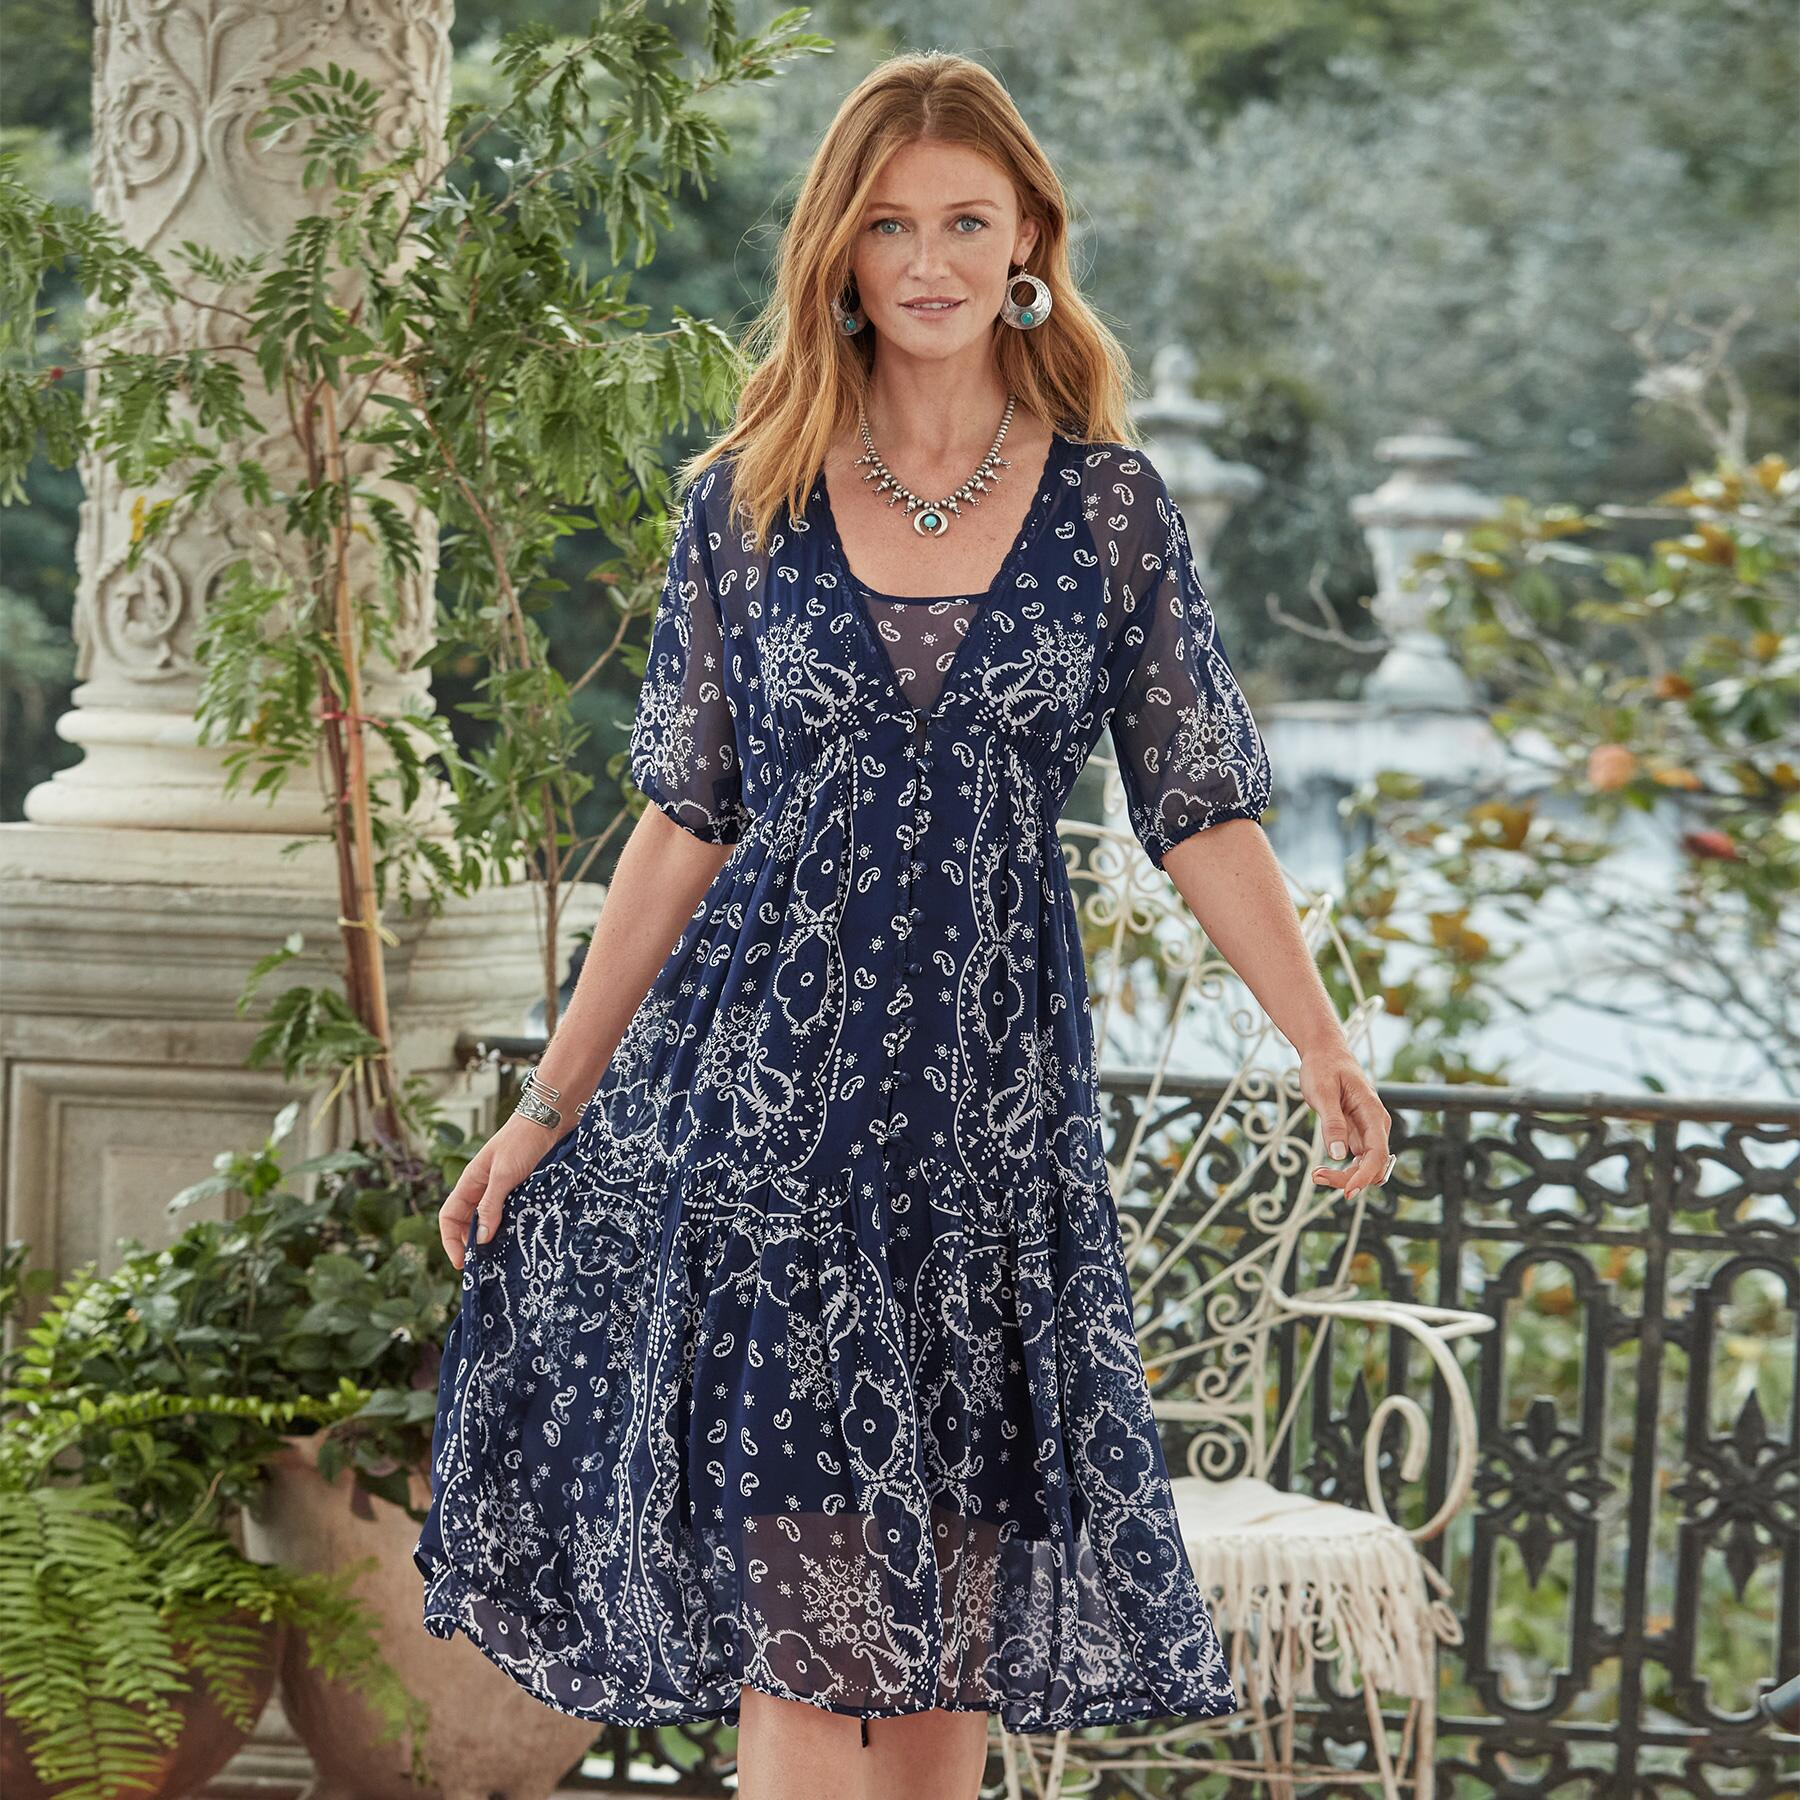 BRIEIA BANDANA DRESS - PETITES: View 2